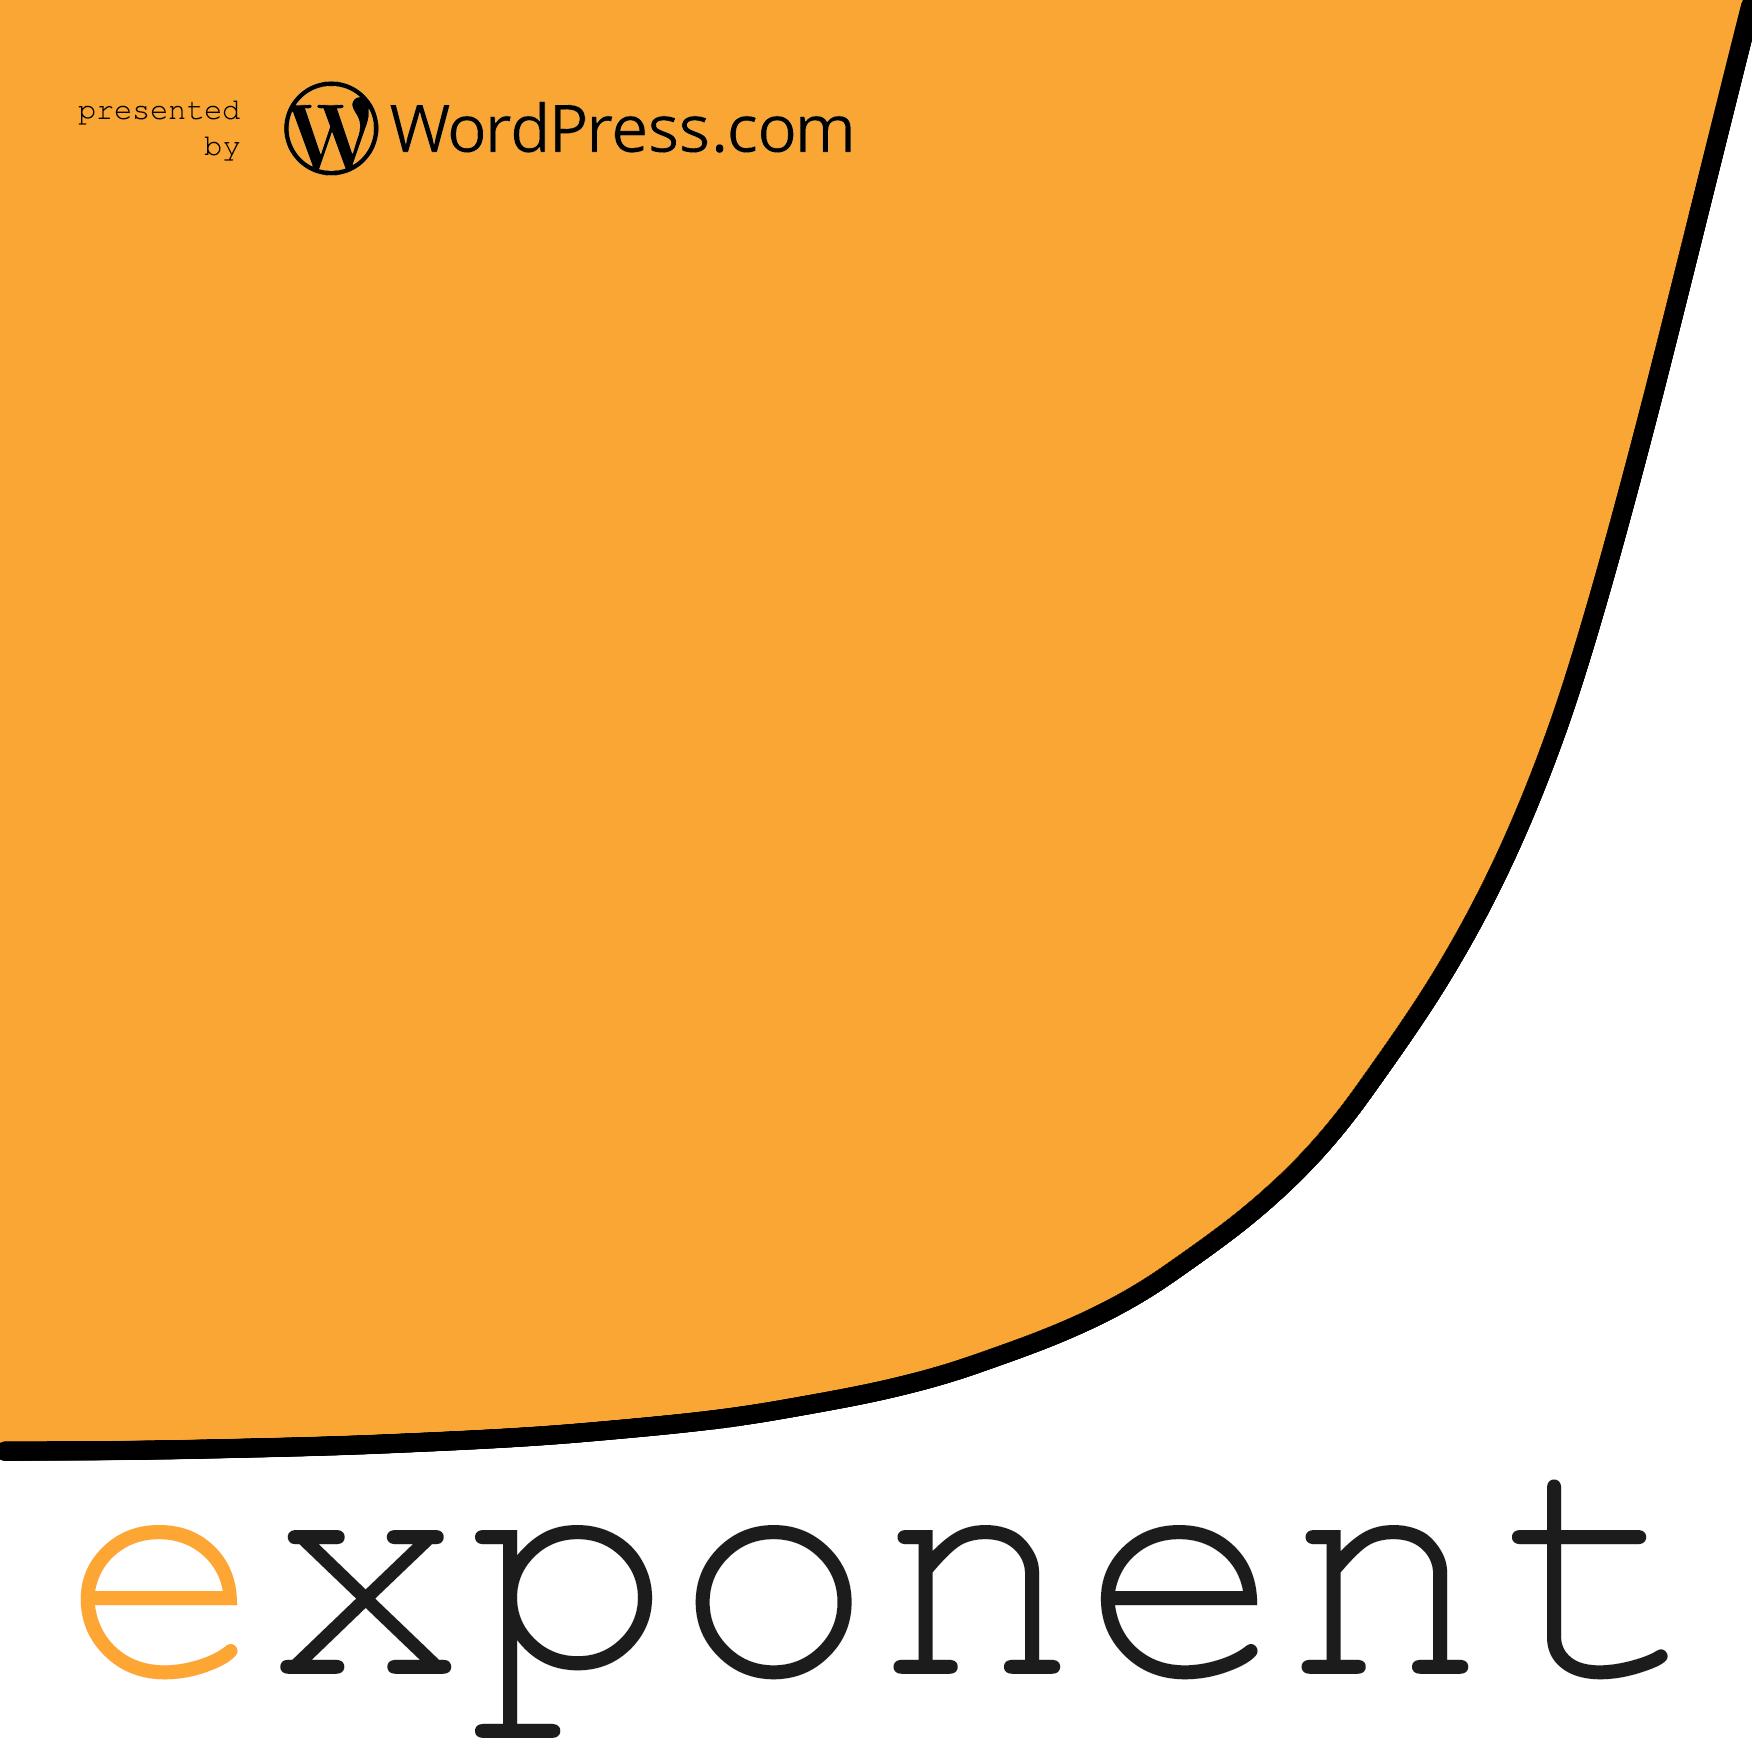 Exponent 3 wp